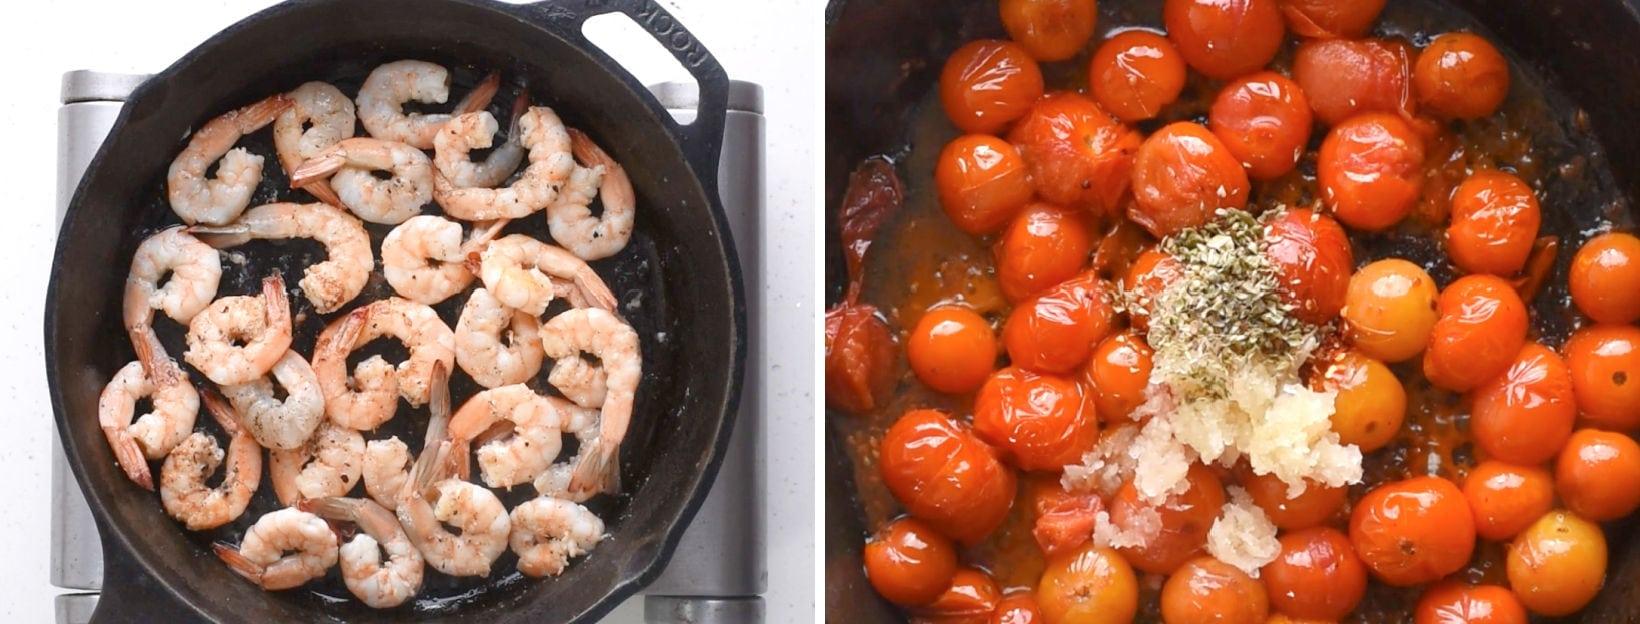 Cook shrimp  and make the cherry tomato Sauce